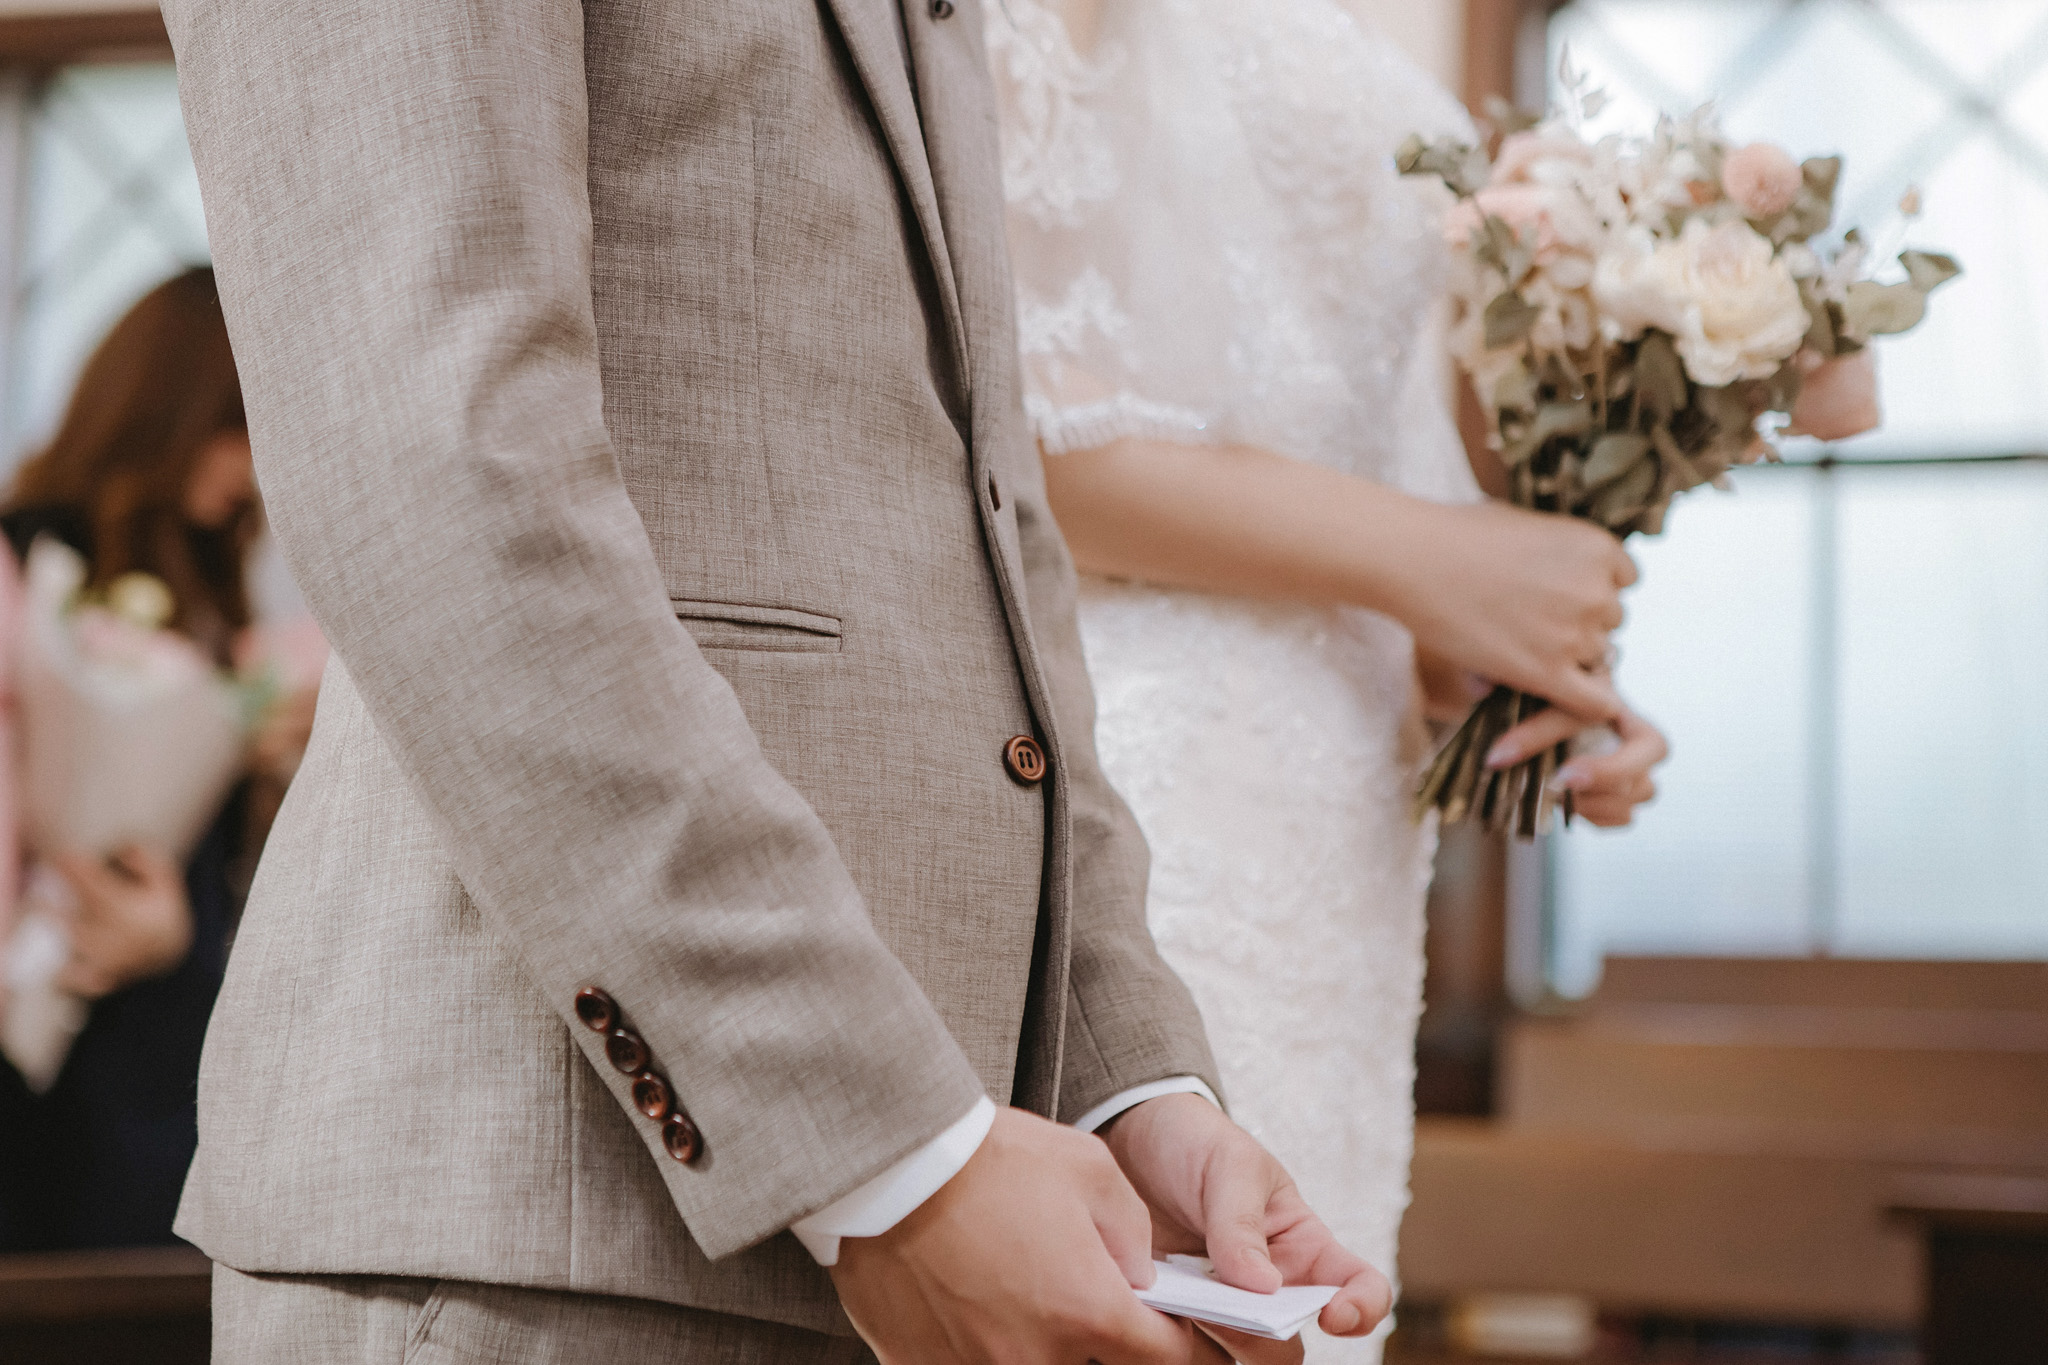 EW 台北婚攝 居米 濟南教會 Brick Yard 33 美軍俱樂部 婚禮 婚宴-45